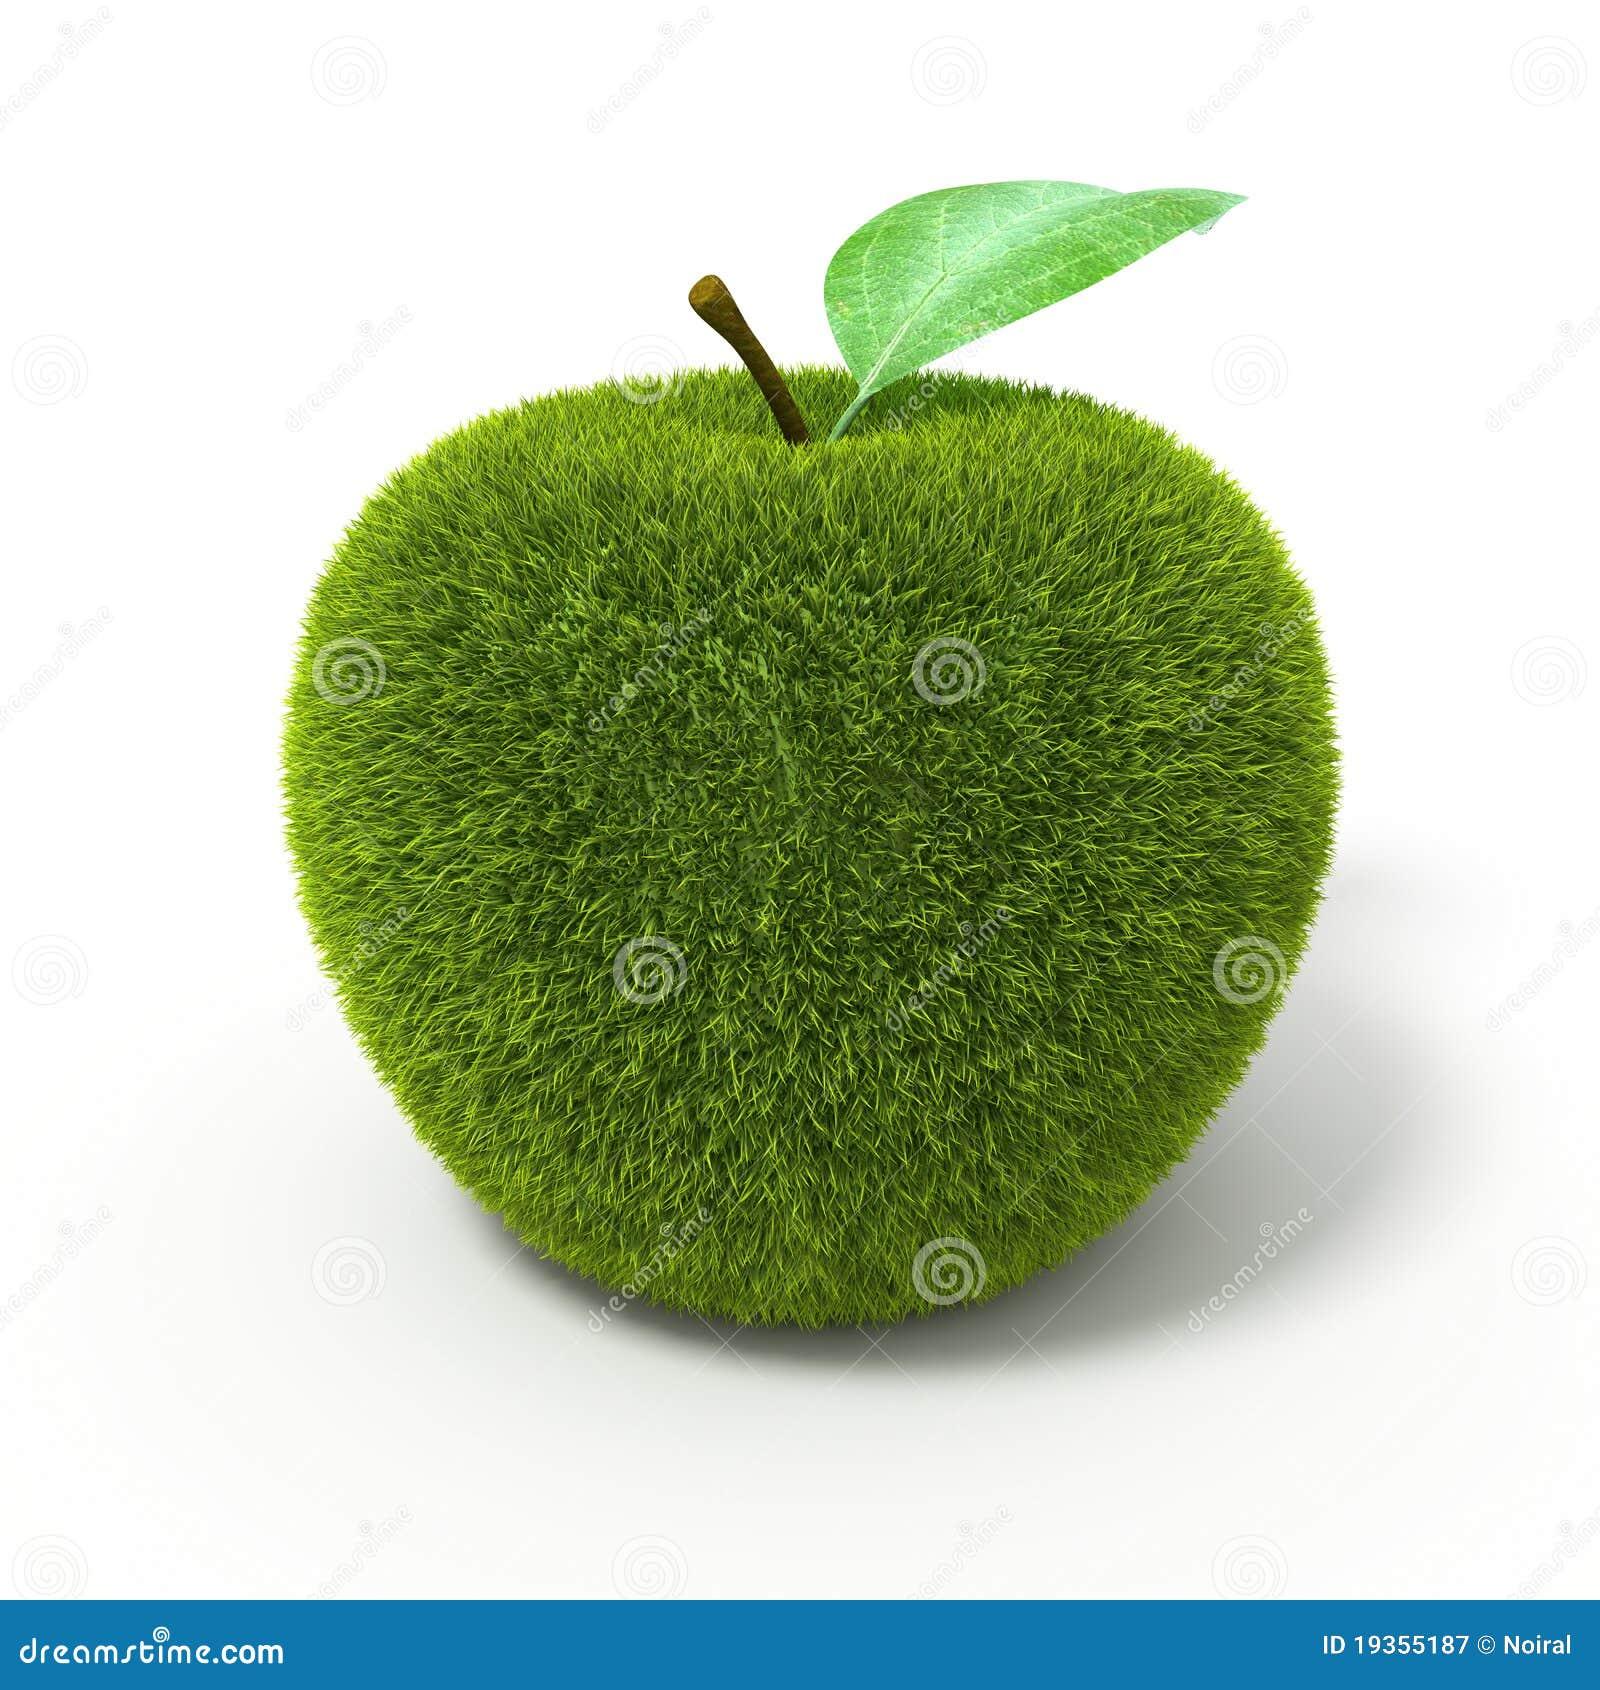 apple fruit background grass - photo #31